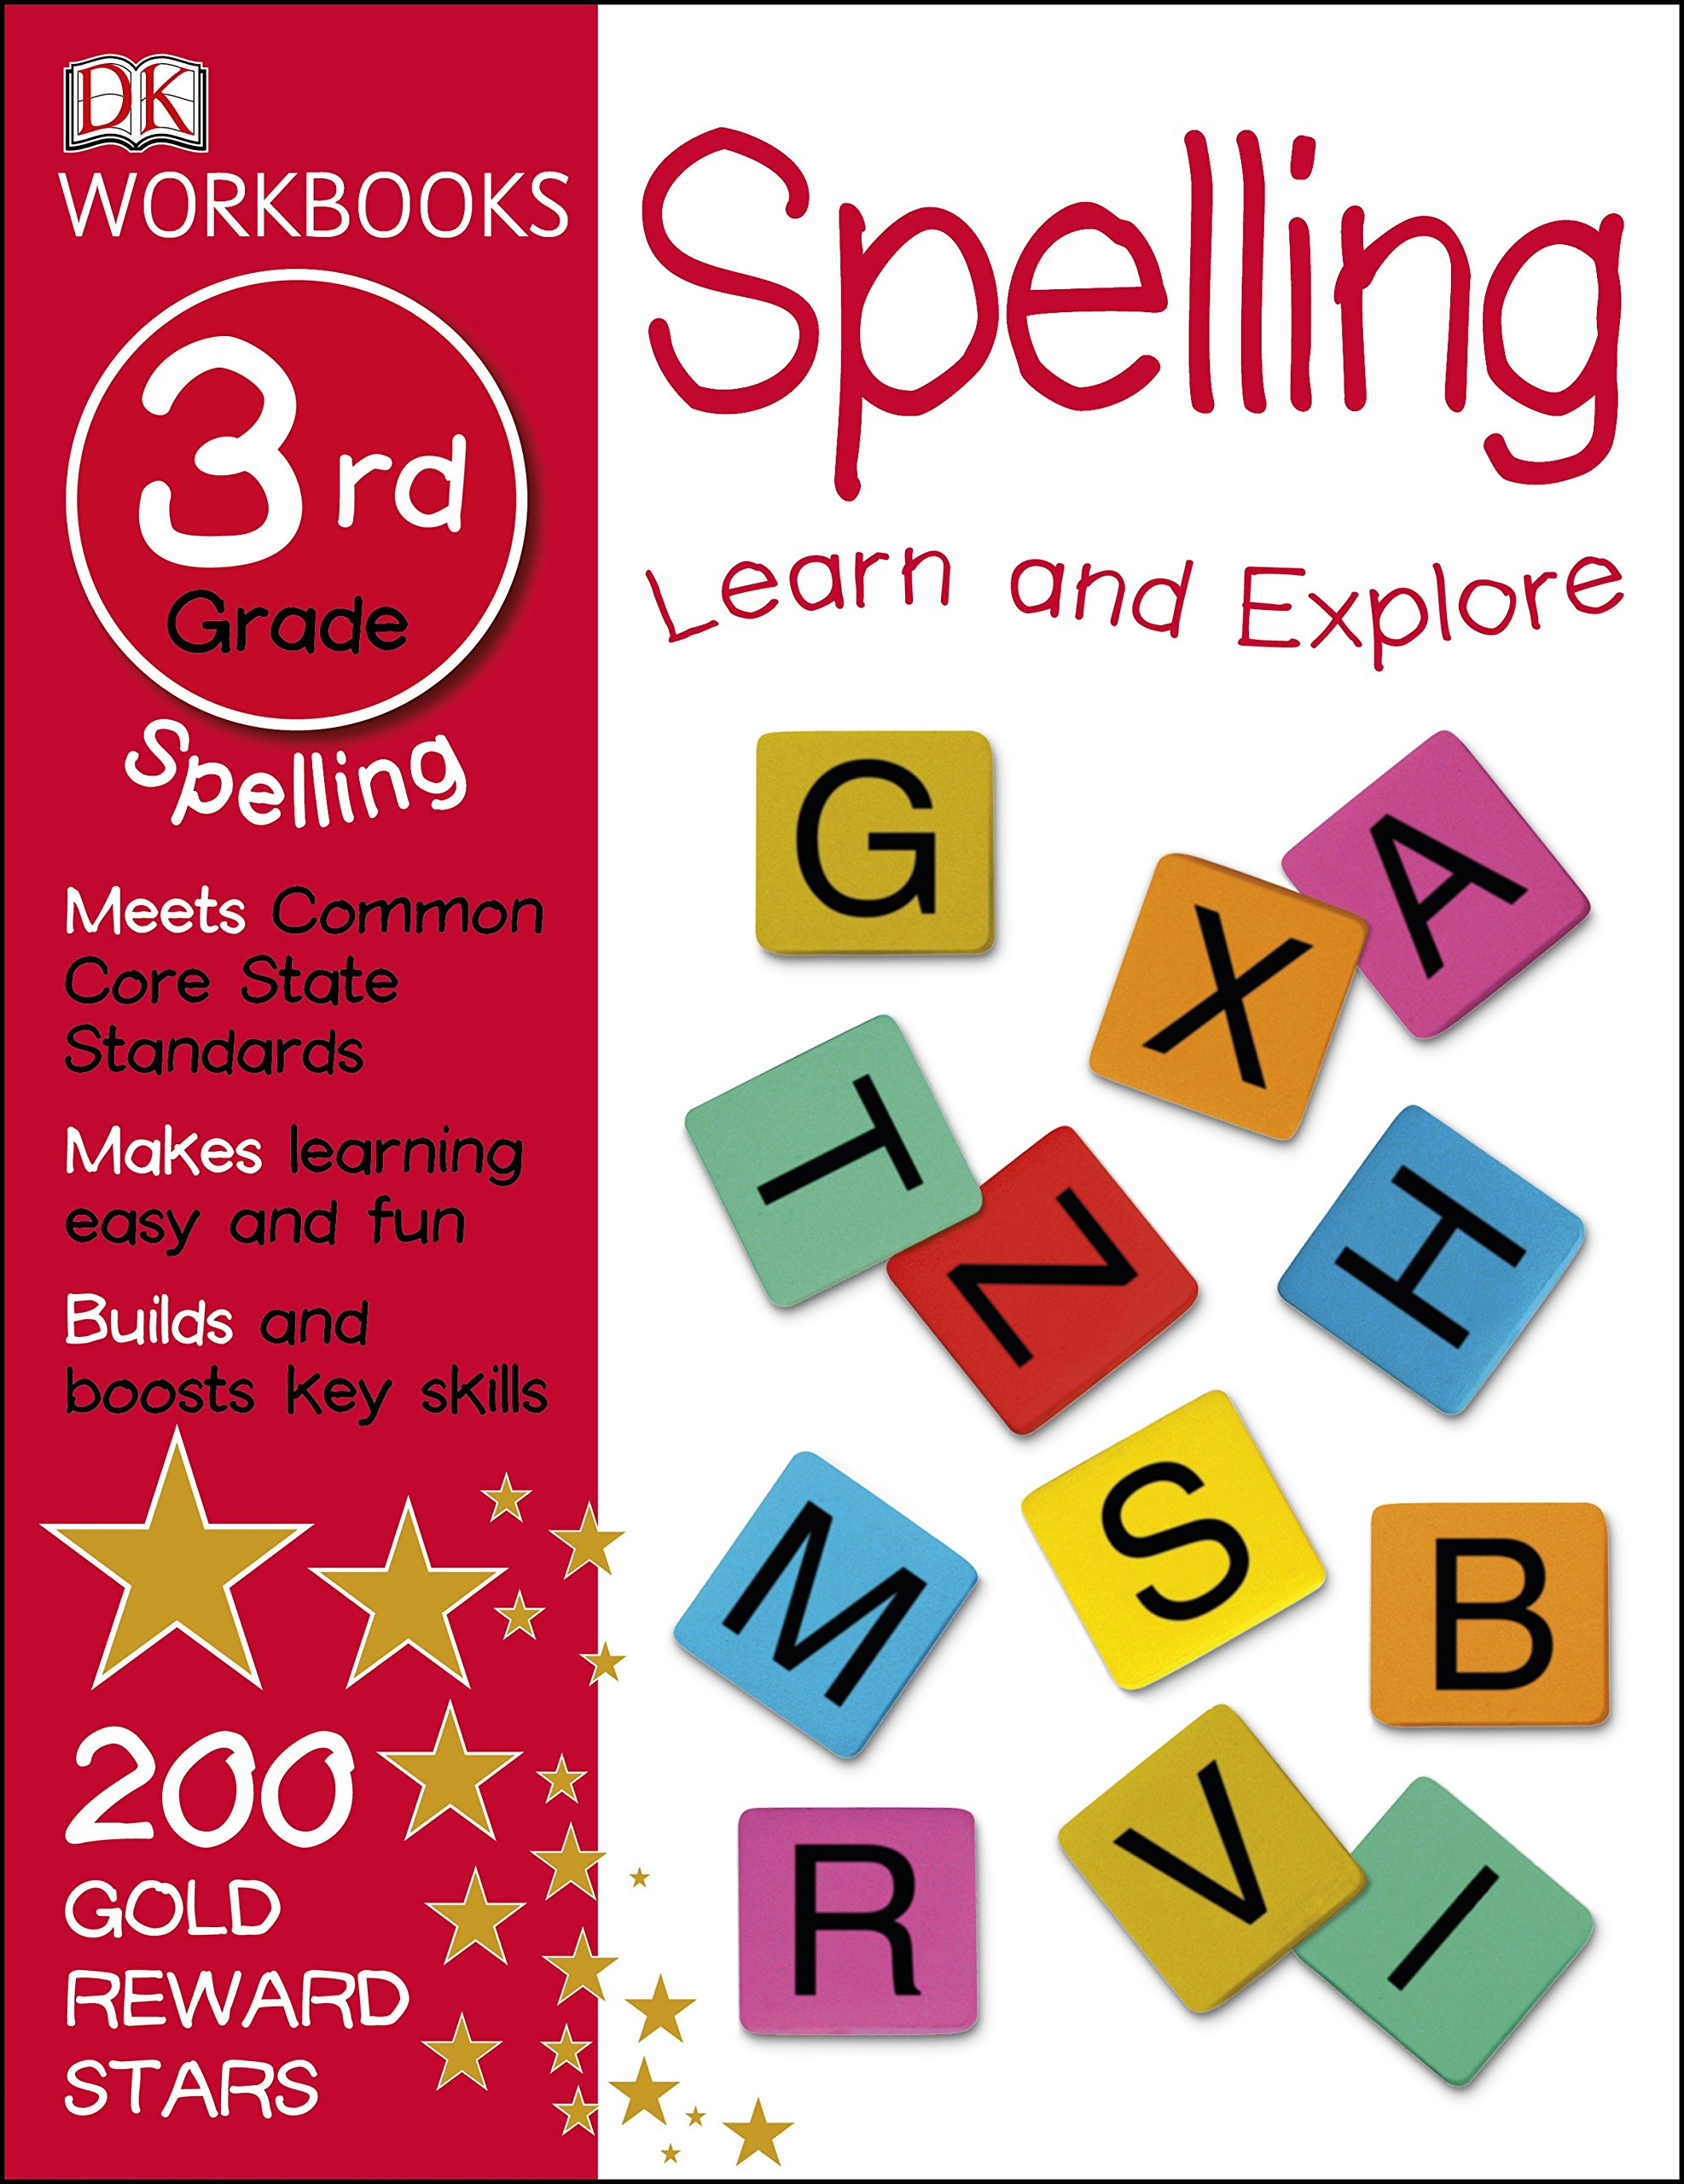 DK Workbooks: Spelling, Third Grade: DK: 9781465429131: Amazon.com ...